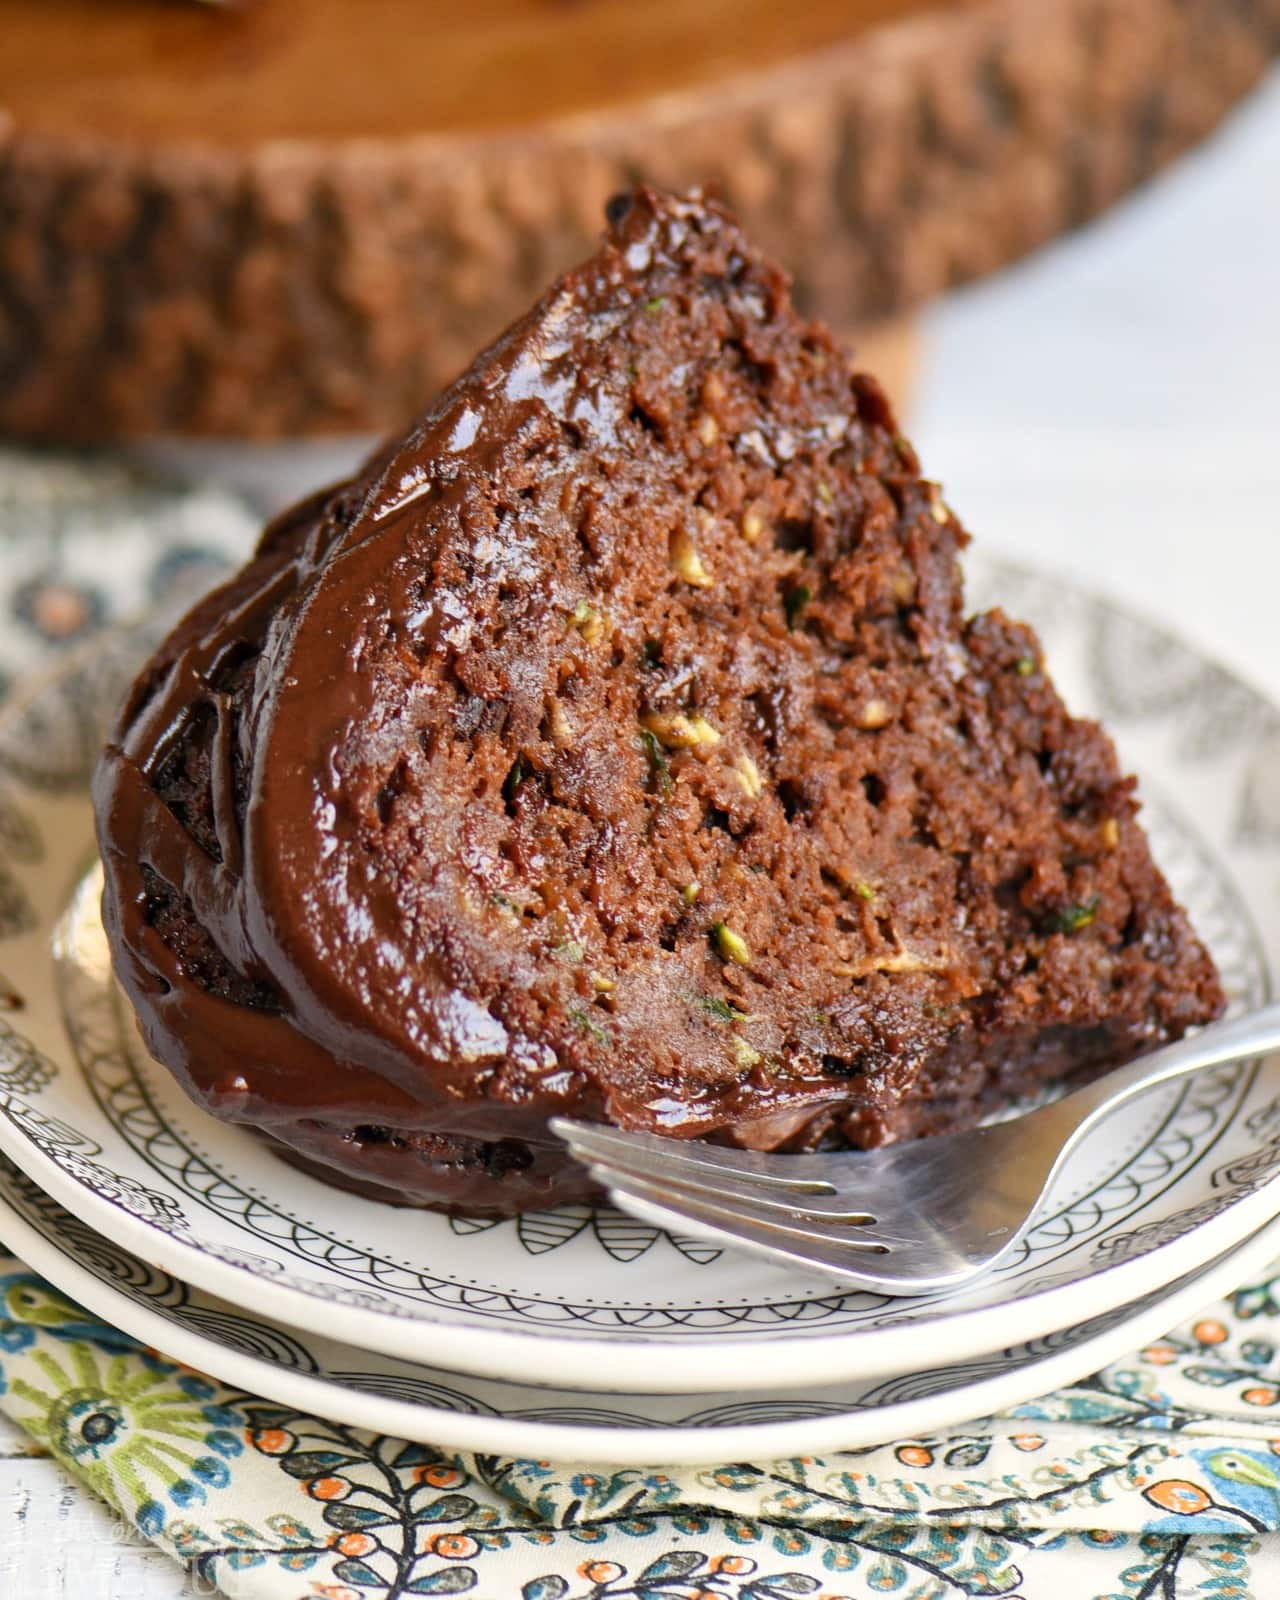 Chocolate Zucchini Cake Recipe - Mom On Timeout